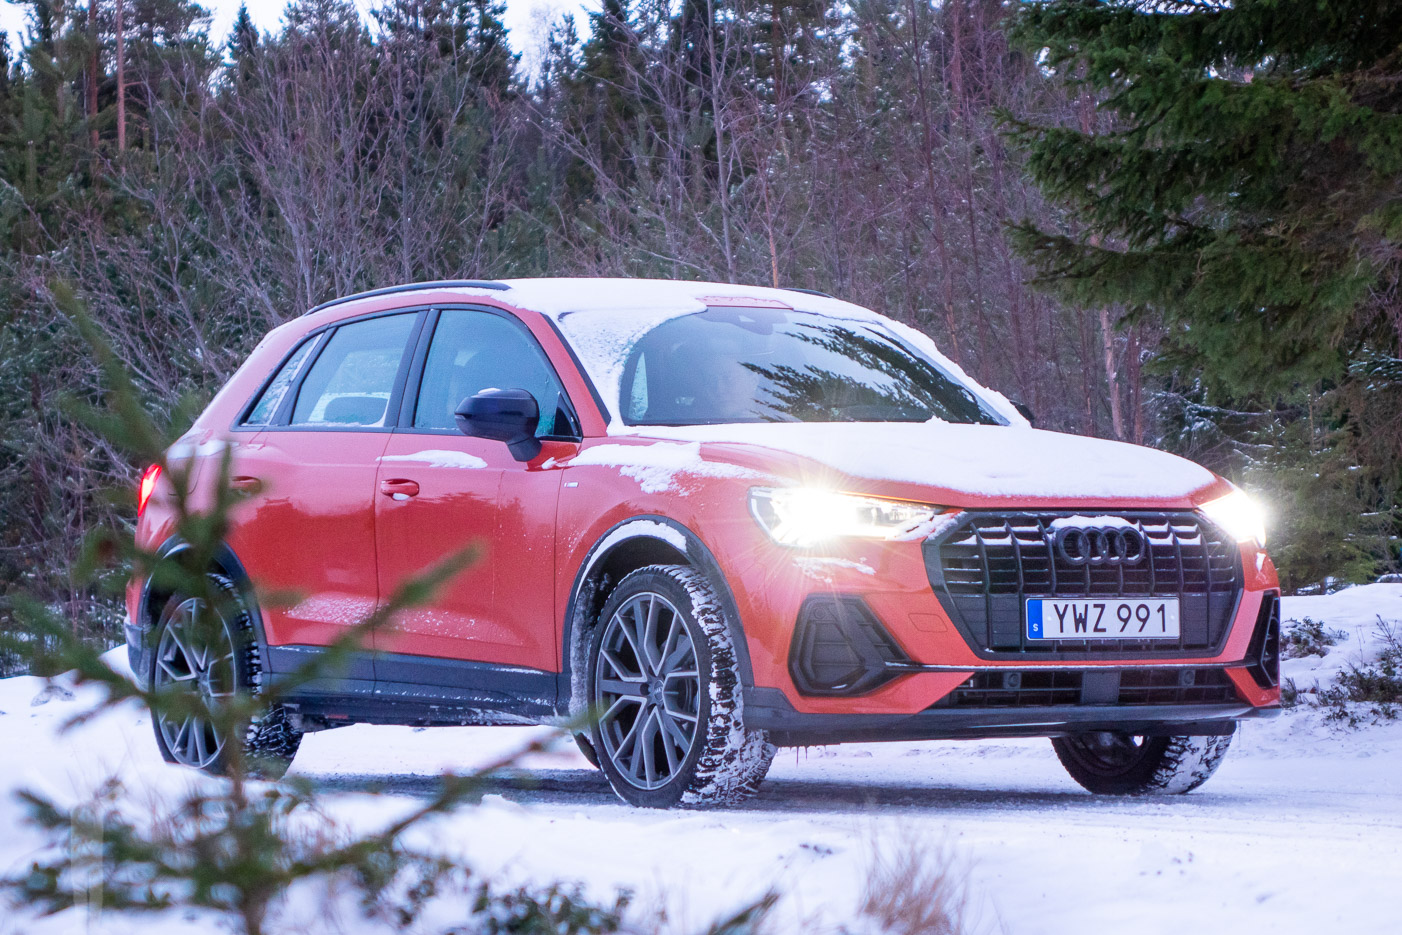 Provkörning Nya Audi Q3 35 Tfsi 2019 Flyingdryden